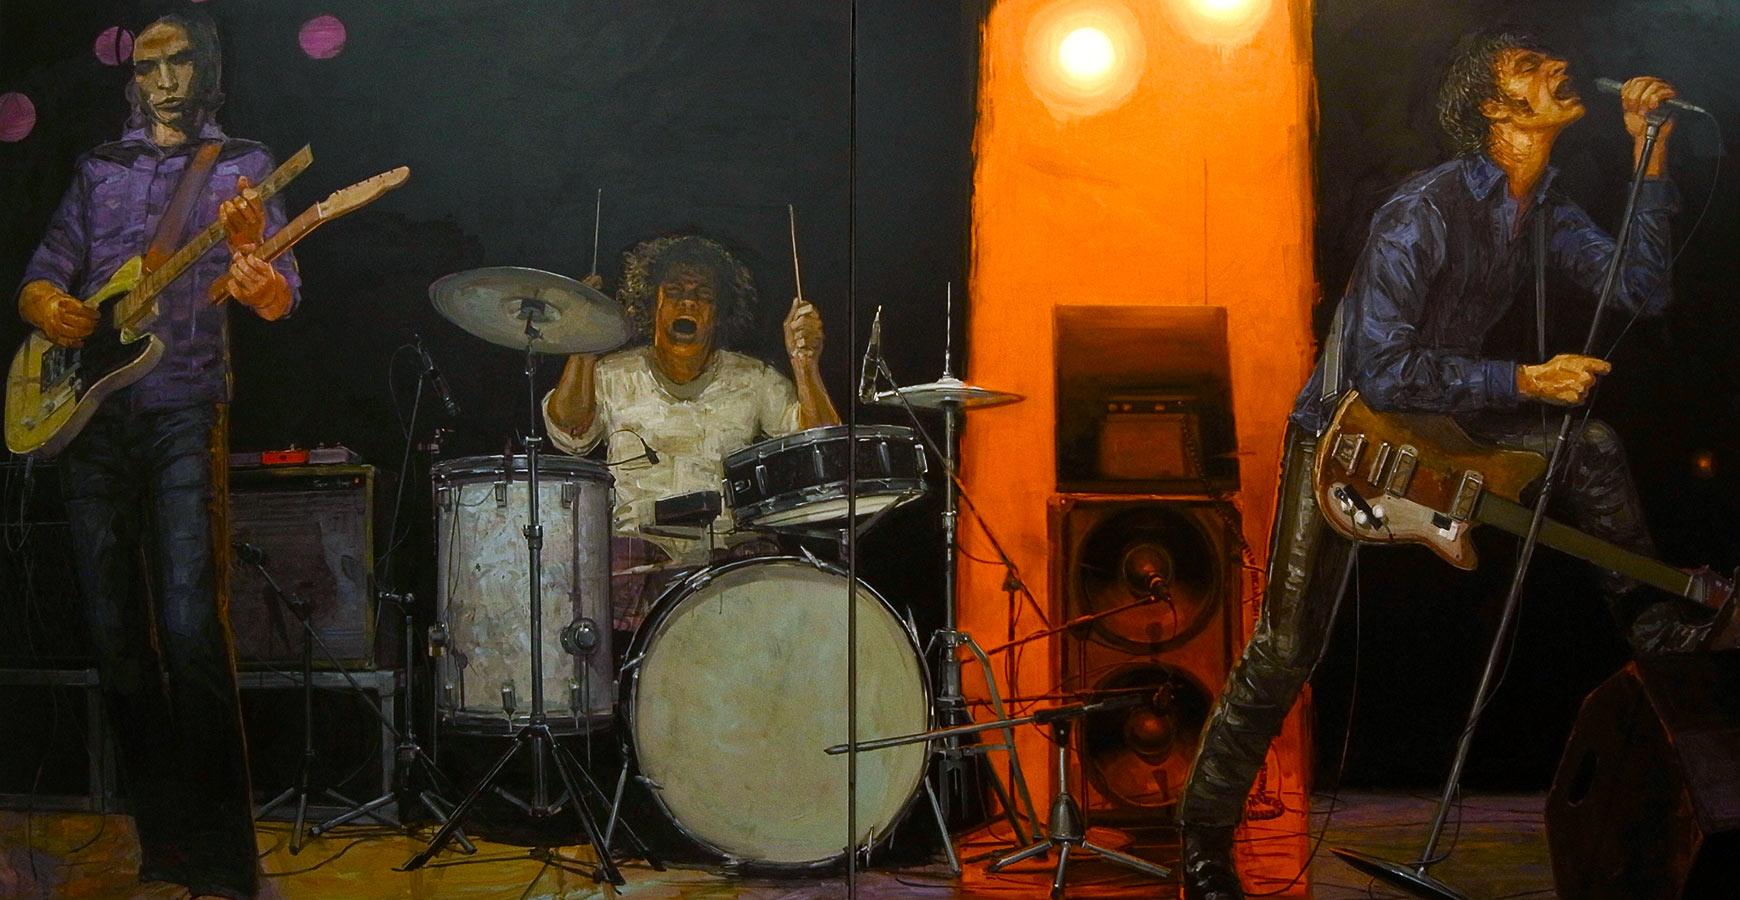 Ballroom. Diptyque, huile sur toile, 181 x 342 cm